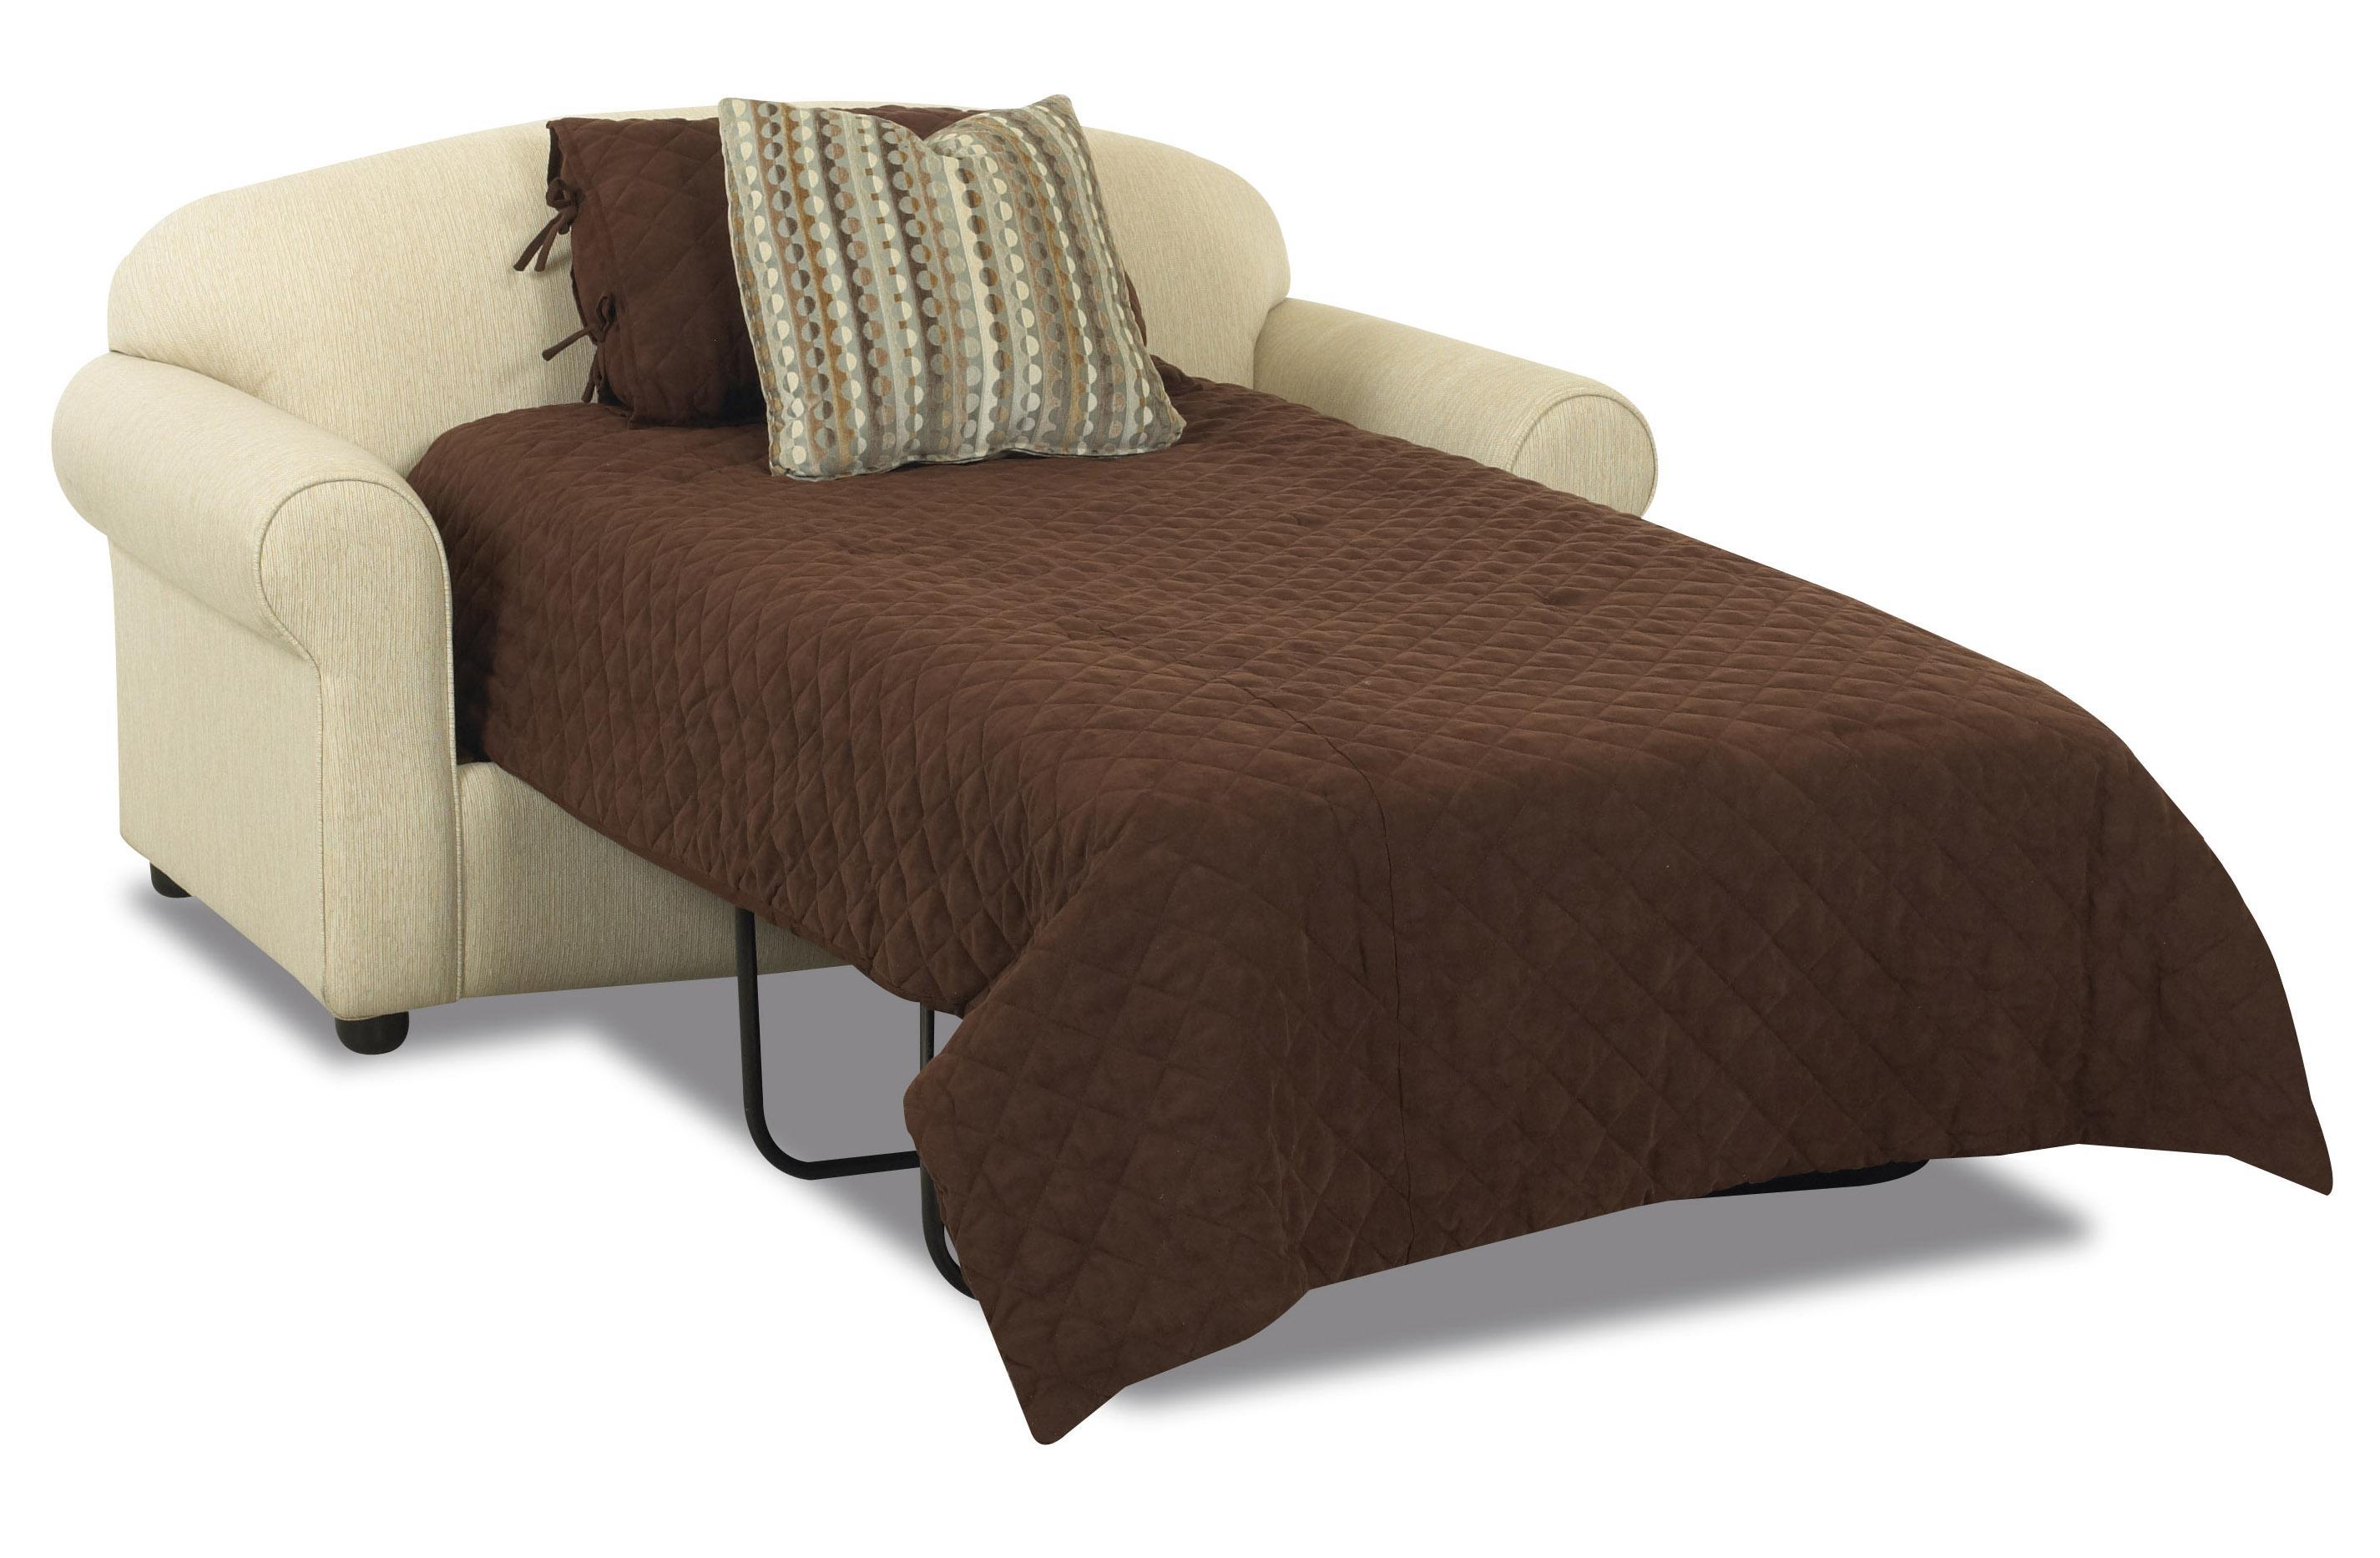 Klaussner Possibilities Innerspring Twin Sleeper Loveseat Value City Furniture Sleeper Sofas